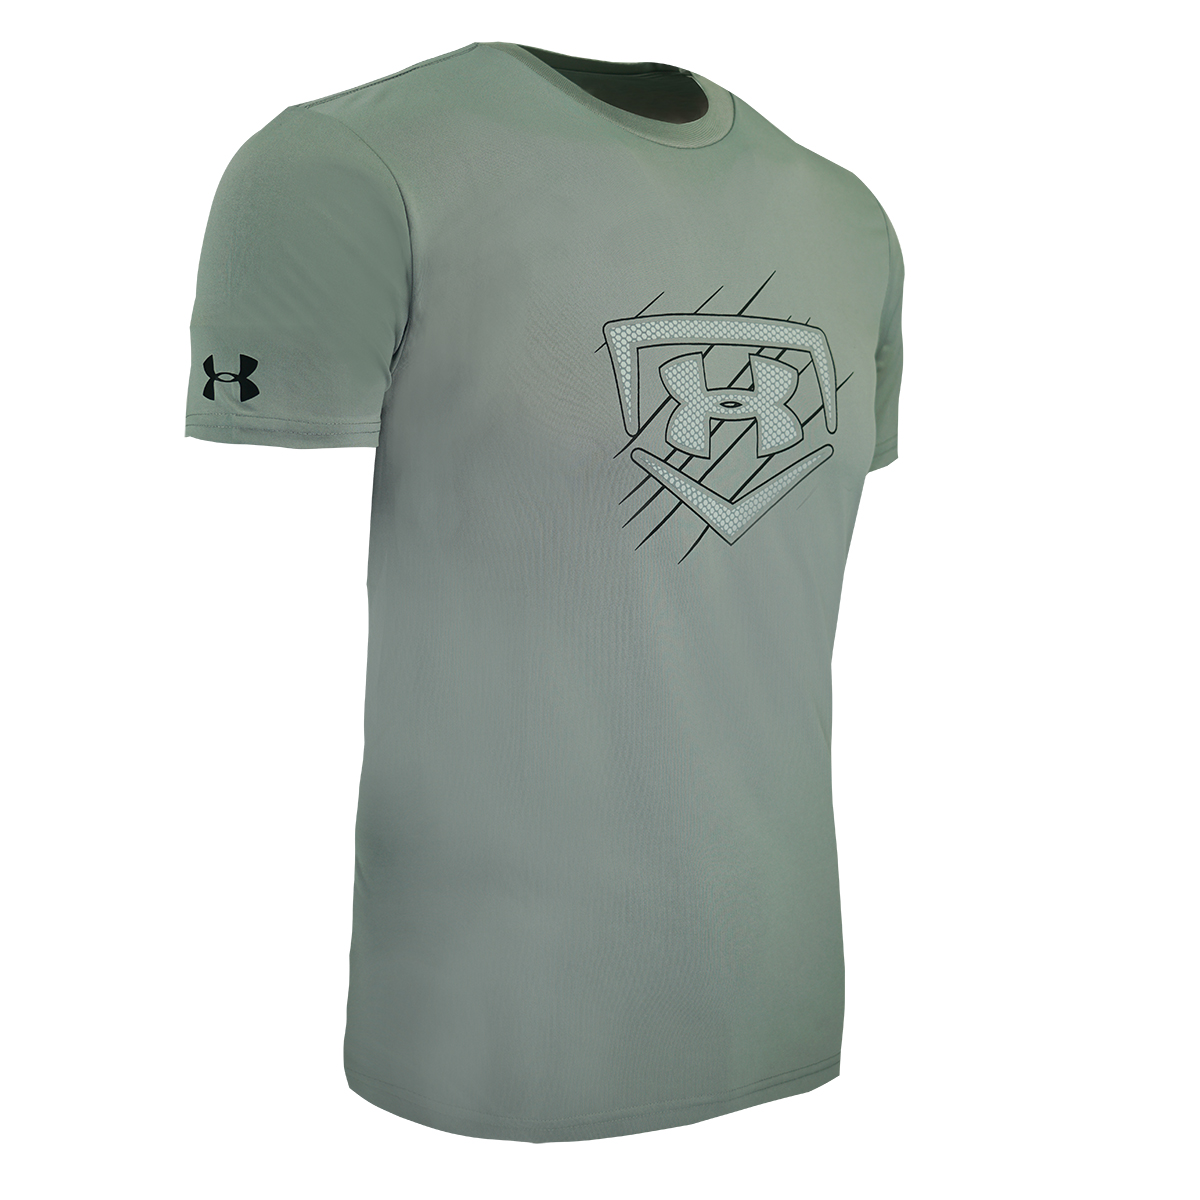 Under-Armour-Men-039-s-Fitted-Tech-Short-Sleeve-Logo-T-Shirt thumbnail 9